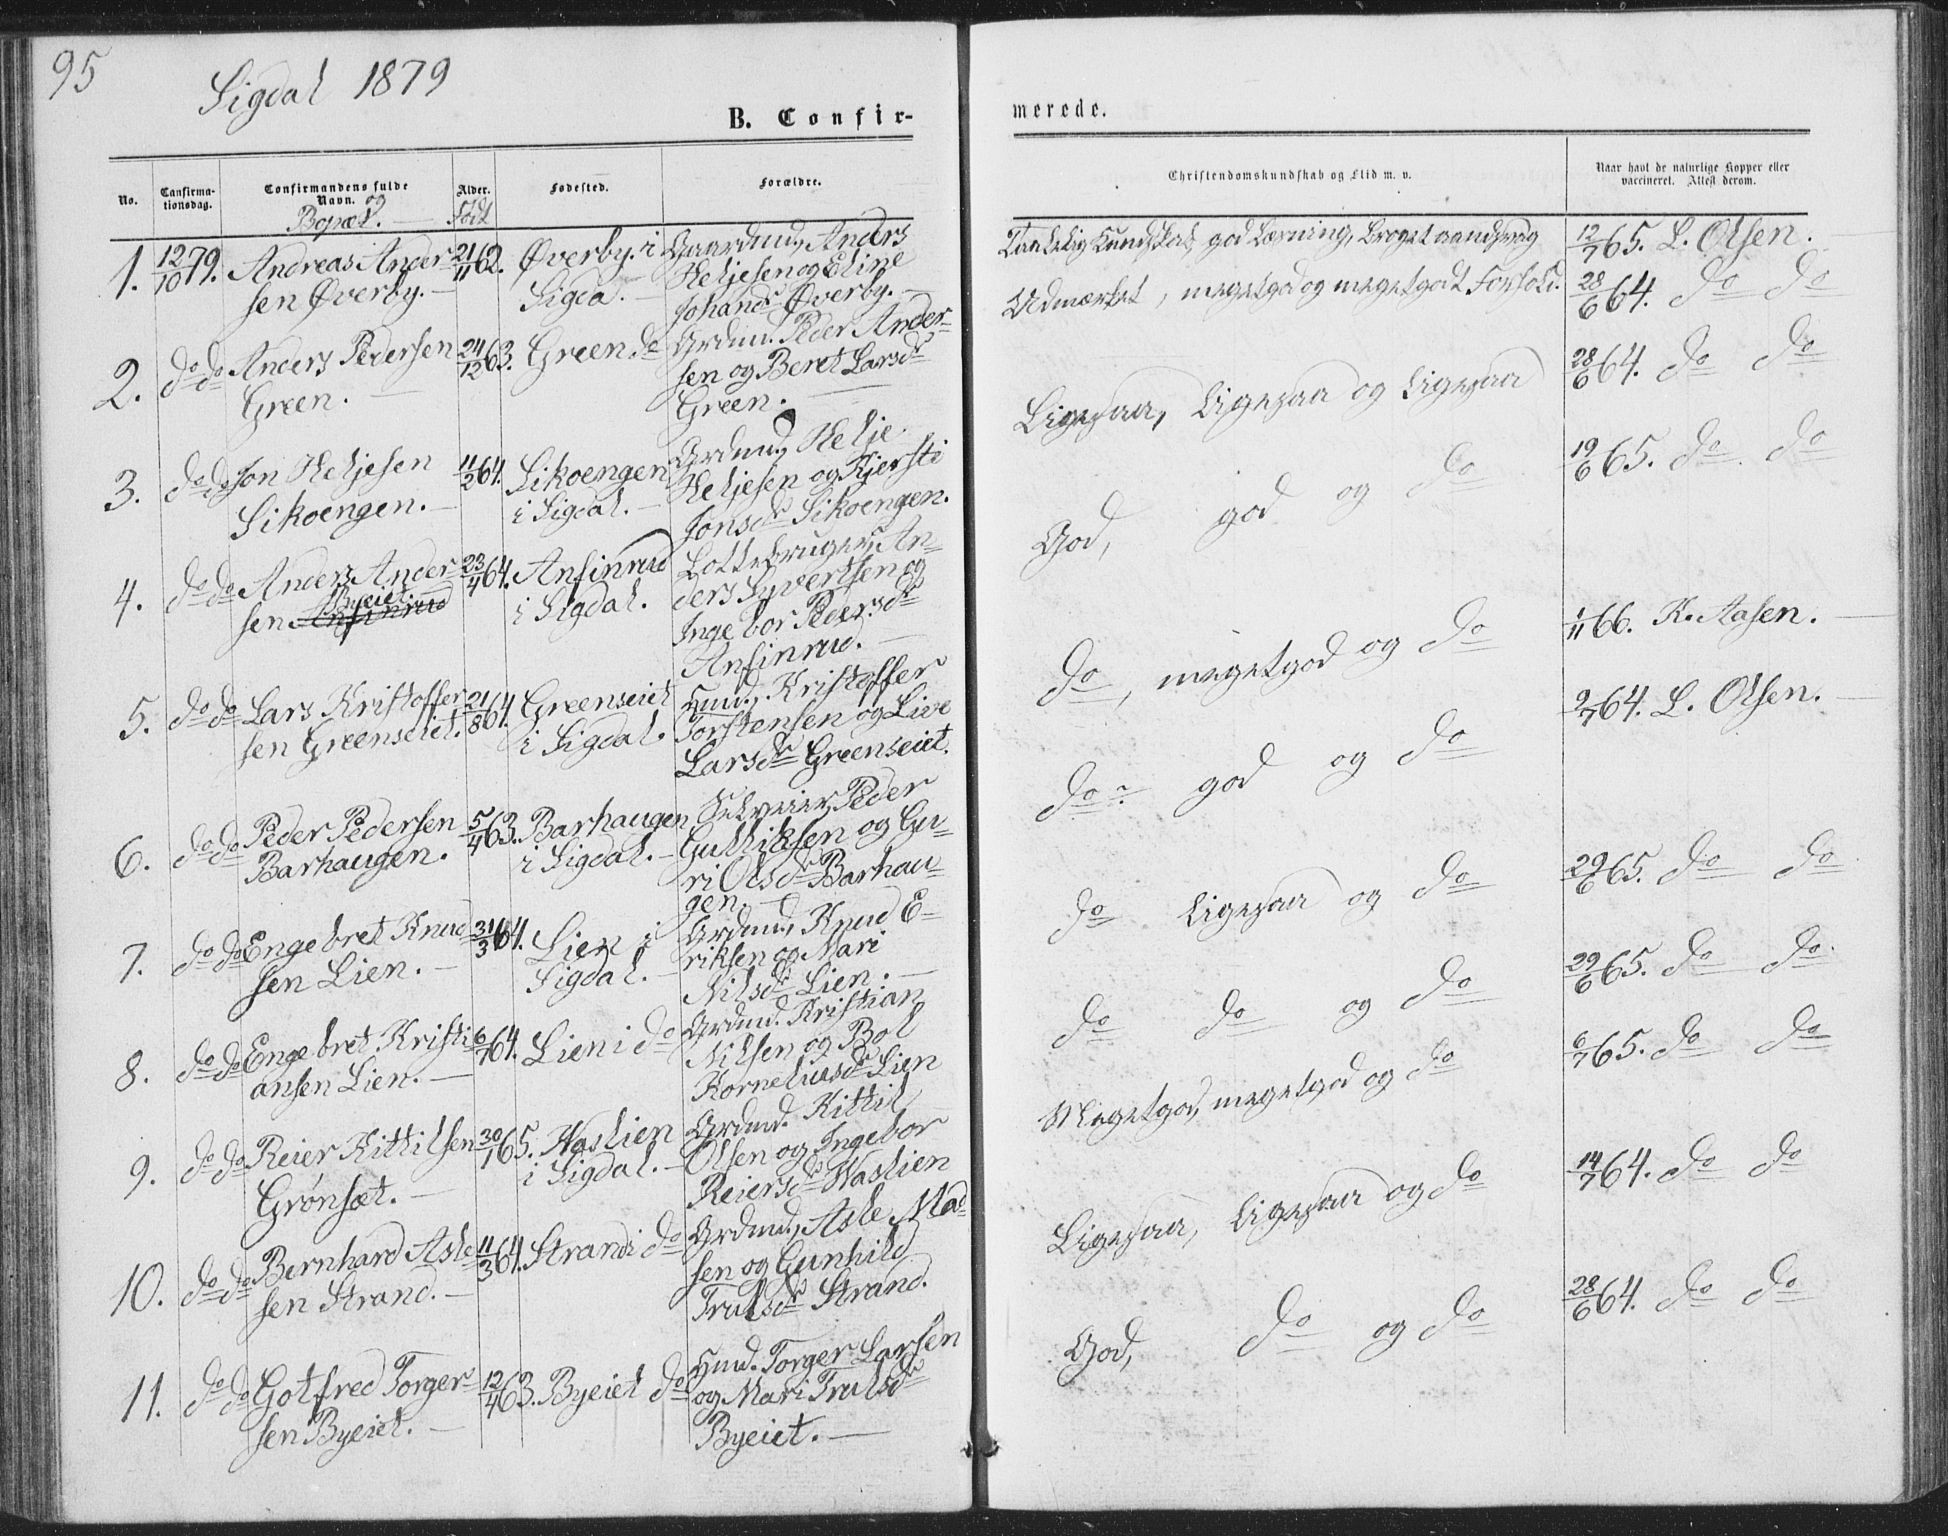 SAKO, Sigdal kirkebøker, G/Ga/L0004: Klokkerbok nr. I 4, 1879-1885, s. 95